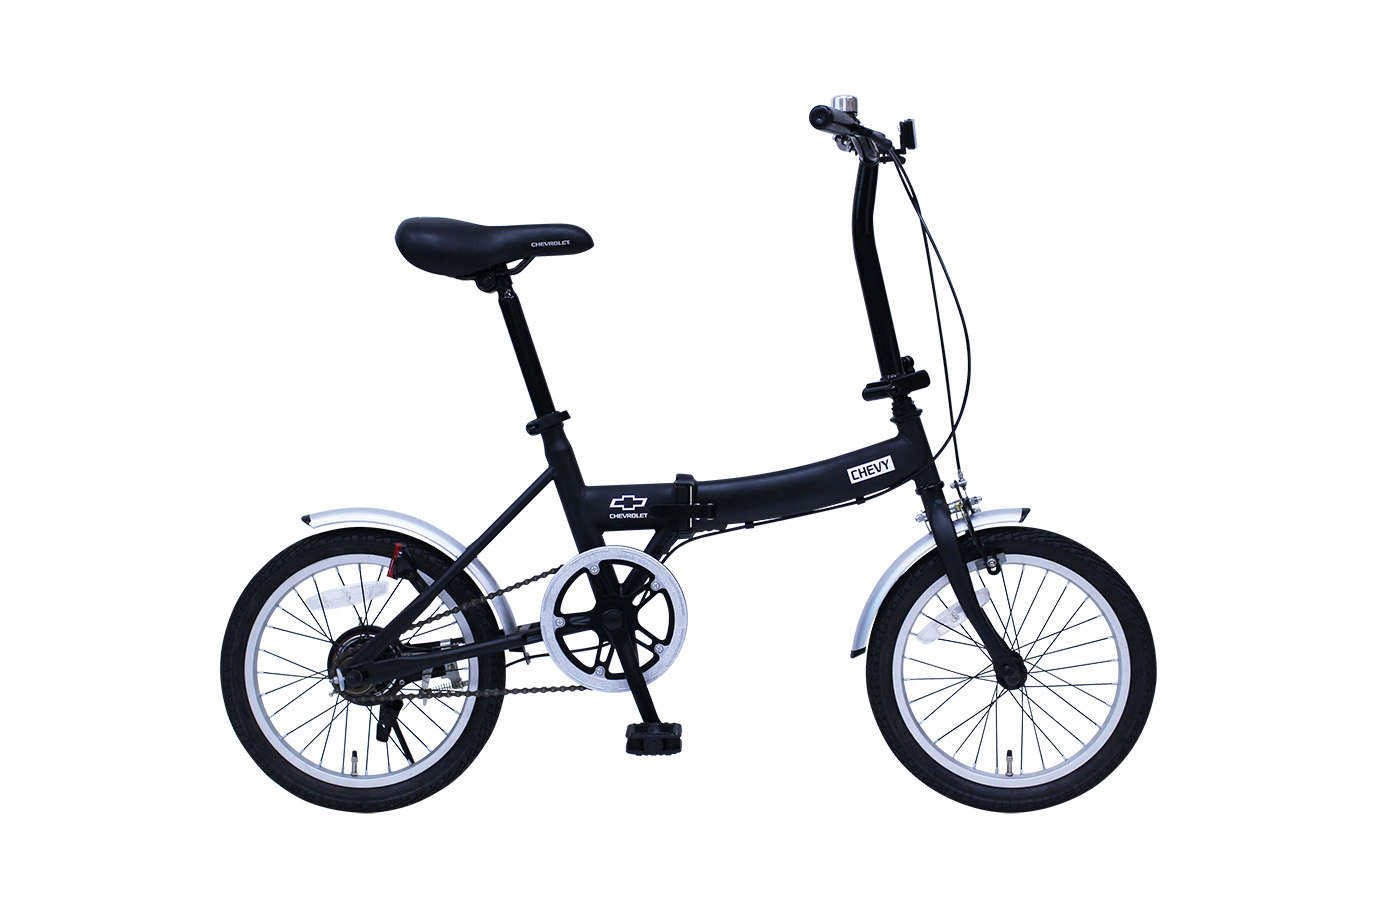 CHEVROLET CHEVROLET シボレー 16インチ折畳自転車(ブラック) 通販]2019Feb MG-CV16G[ミムゴ MIMUGO][激安自転車 MG-CV16G[ミムゴ 通販]2019Feb, アウトレットファニチャー:e46a497e --- pricklybaymarina.com